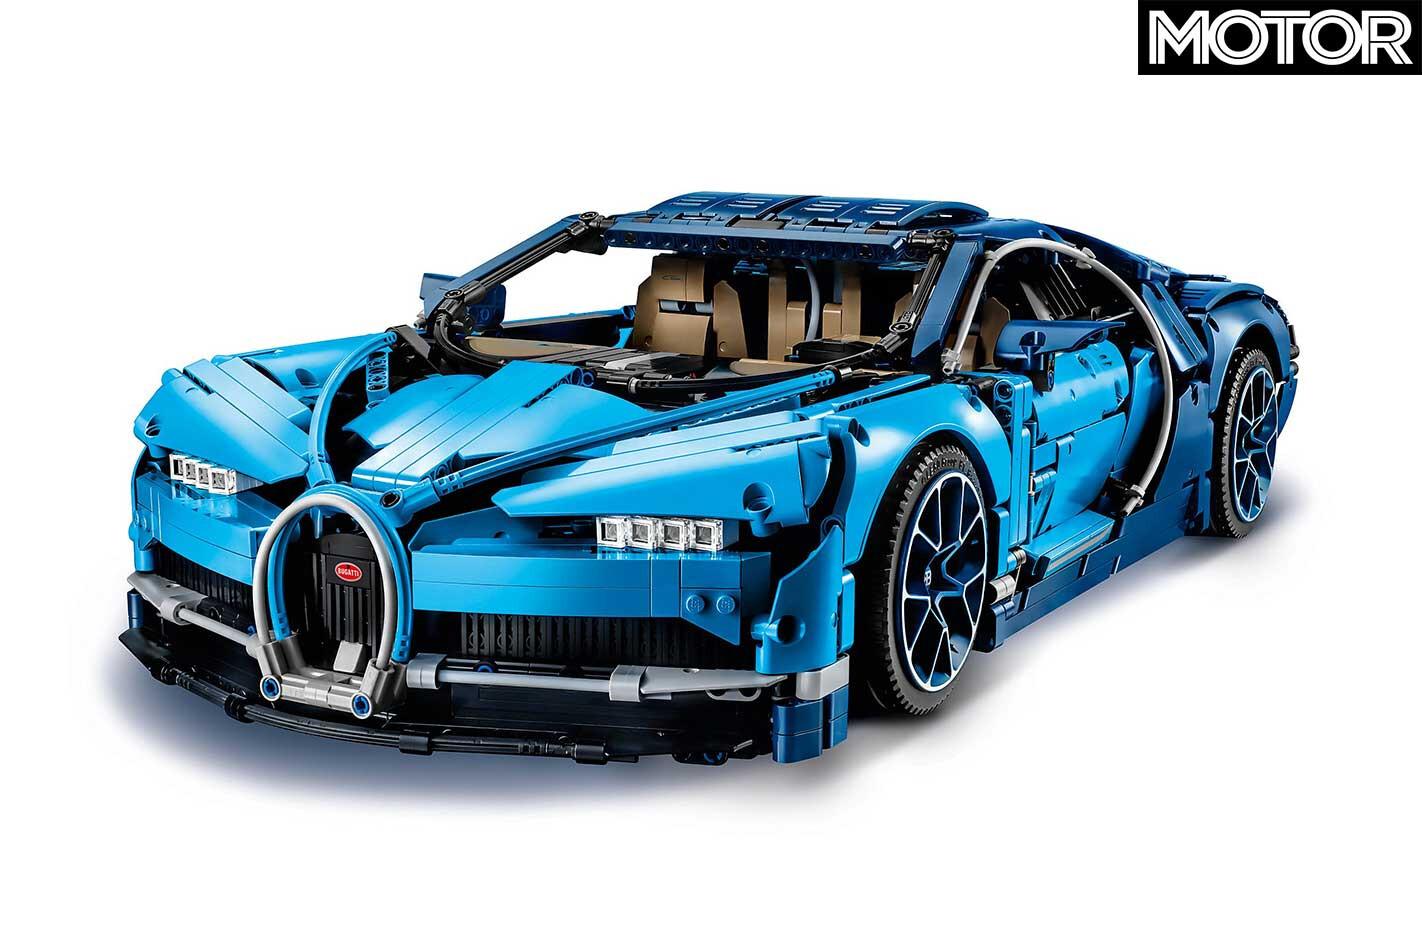 Cool Car Things We Want January 2019 Lego Bugatti Chiron Jpg